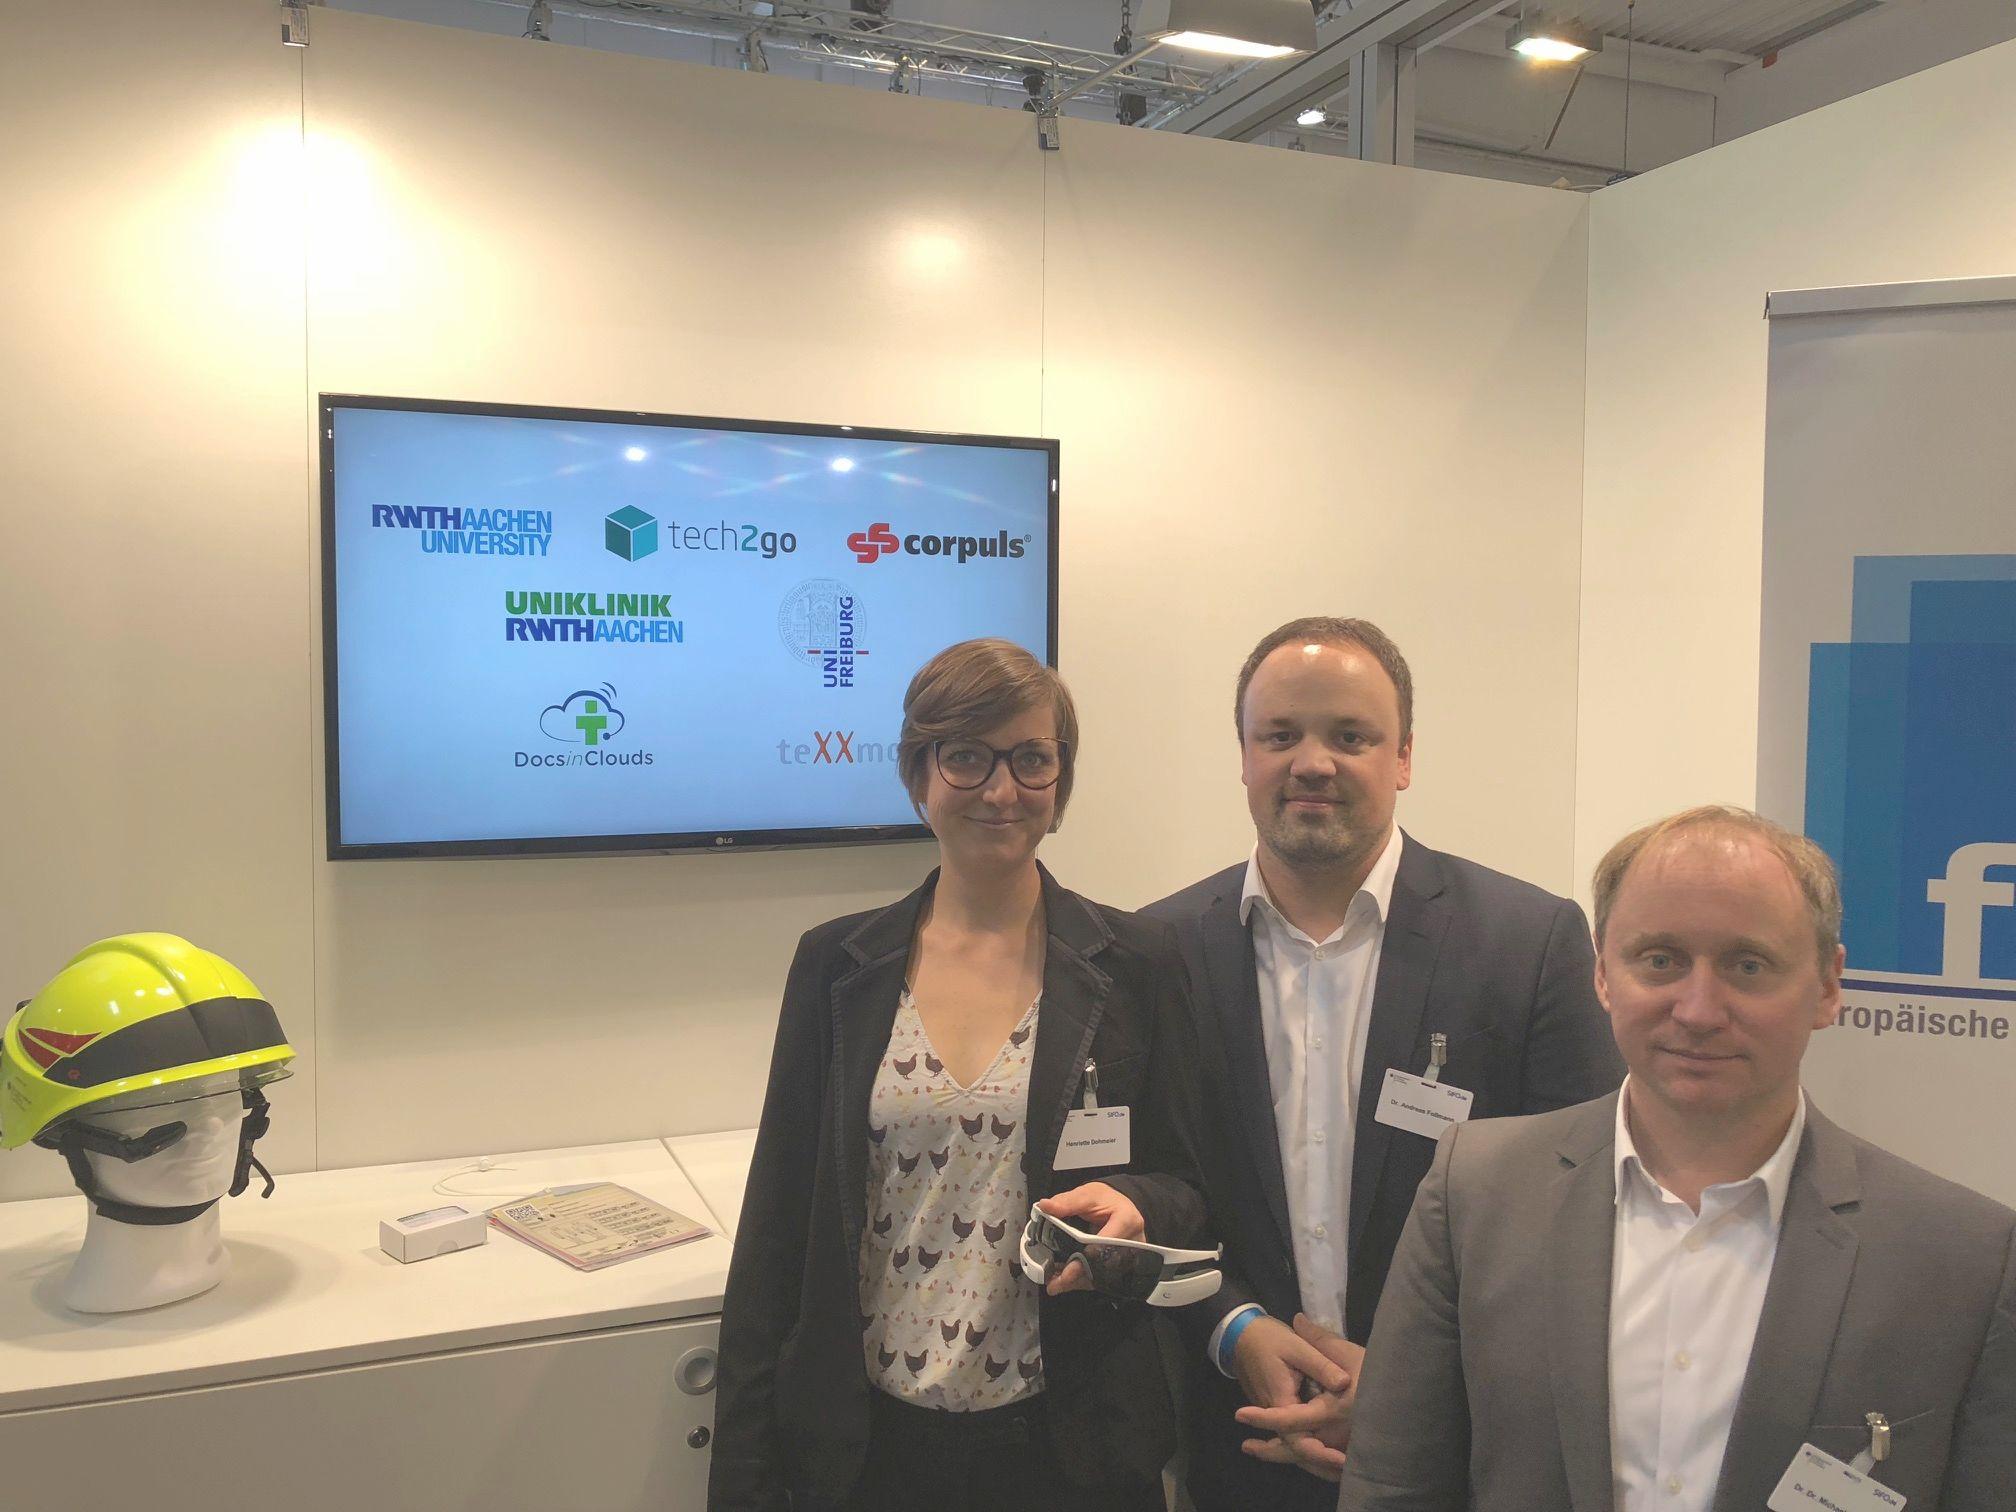 SECURITY fair trade Essen 2018 exhibition AUDIME smart glasses